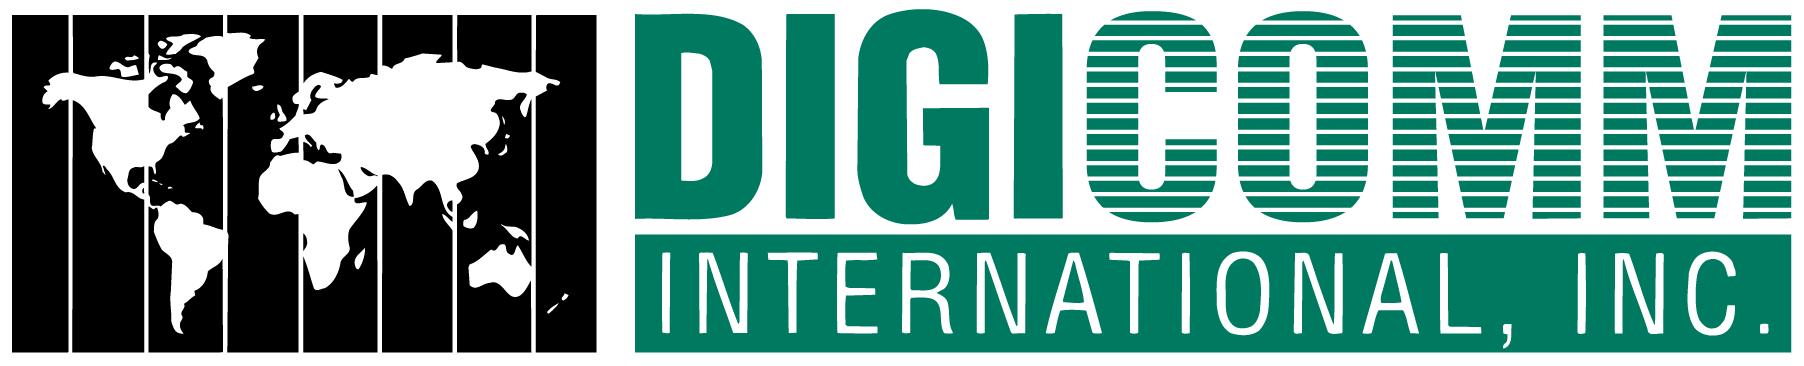 Digicomm logo